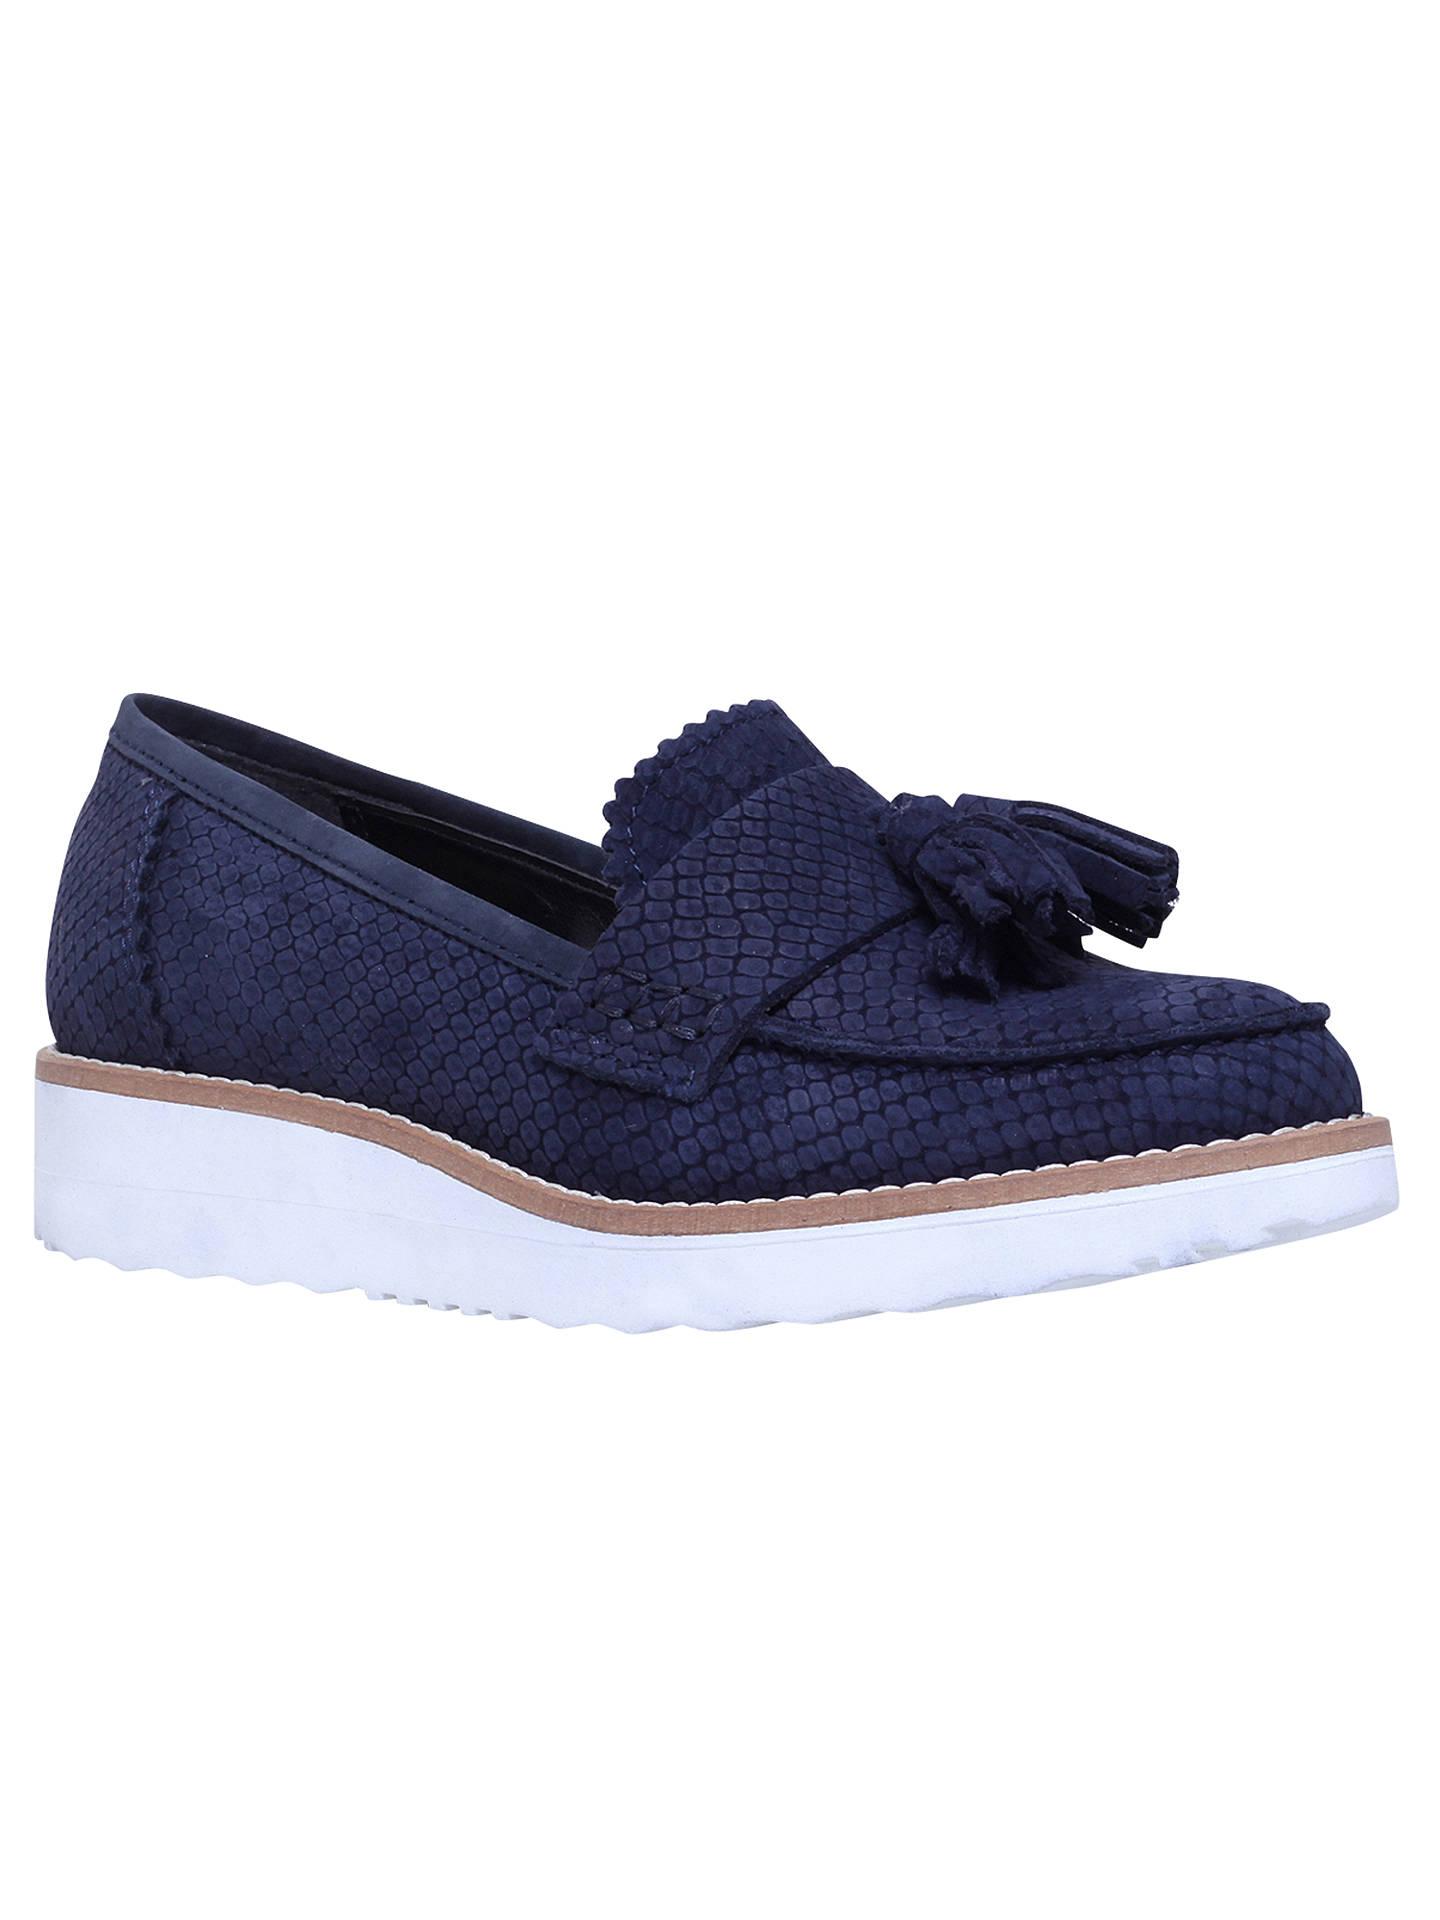 4a181377322 Buy Carvela Limbo Wedge Heeled Loafers